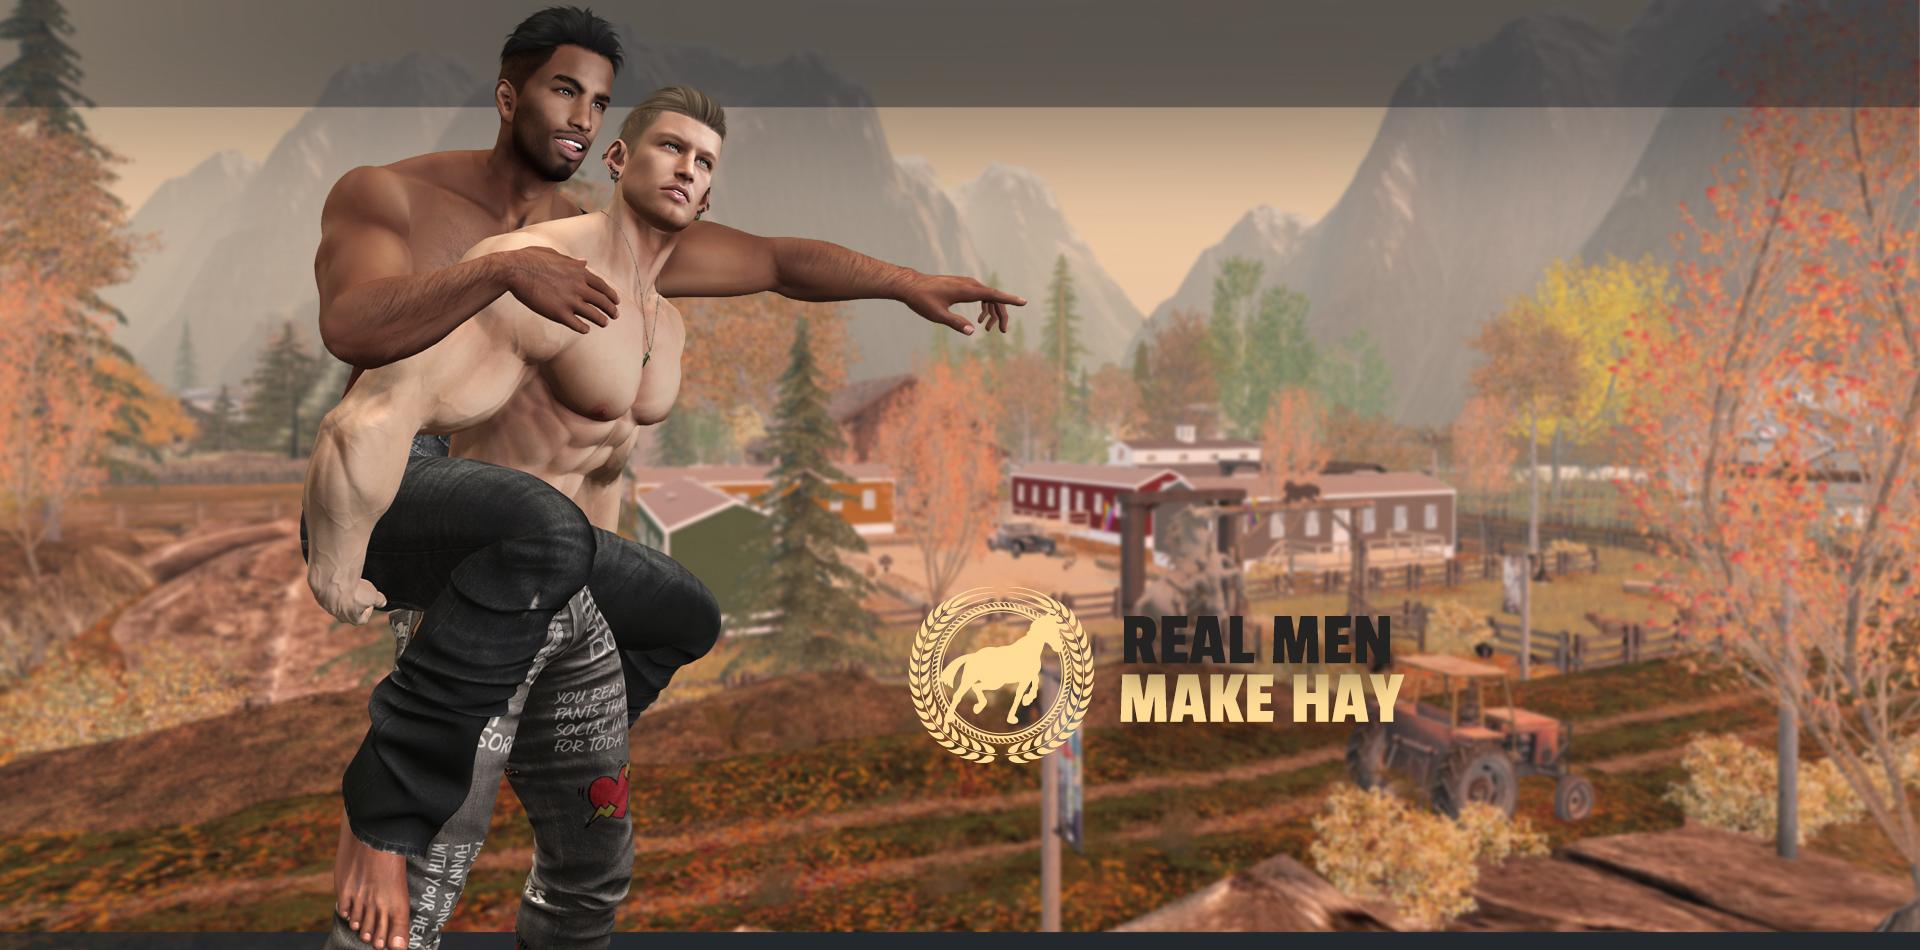 Gay virtual men games